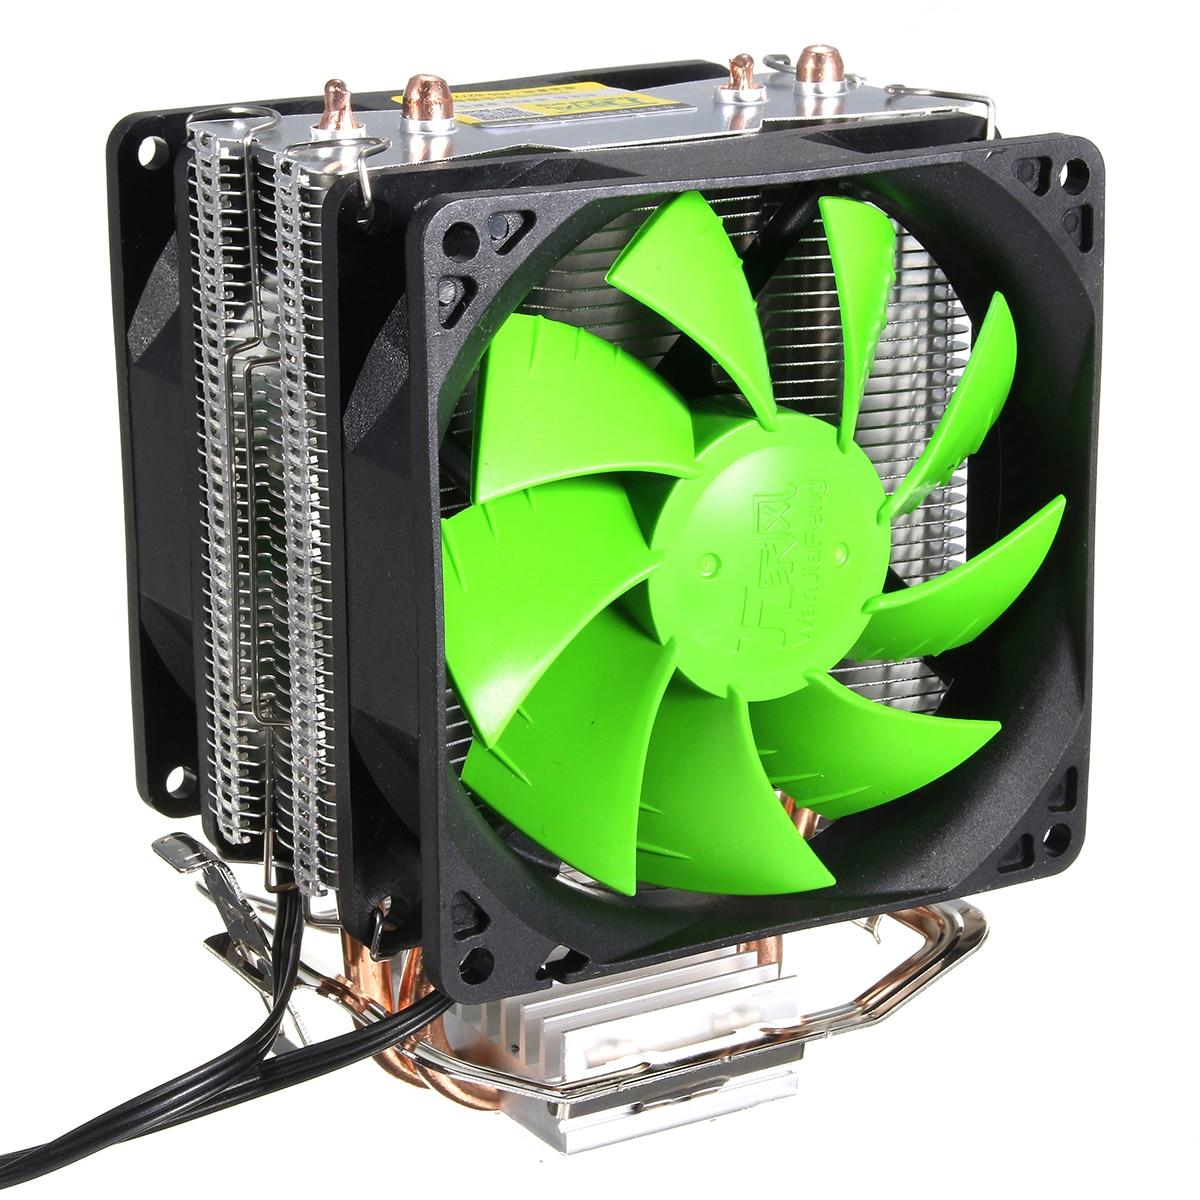 Ventilador doble de 3 pines para CPU, disipador de calor, ventilador de refrigeración de CPU para Intel LGA775/1150/1155 AMD AM2/AM2 +/AM3 AM4 Ryzen Pasta térmica